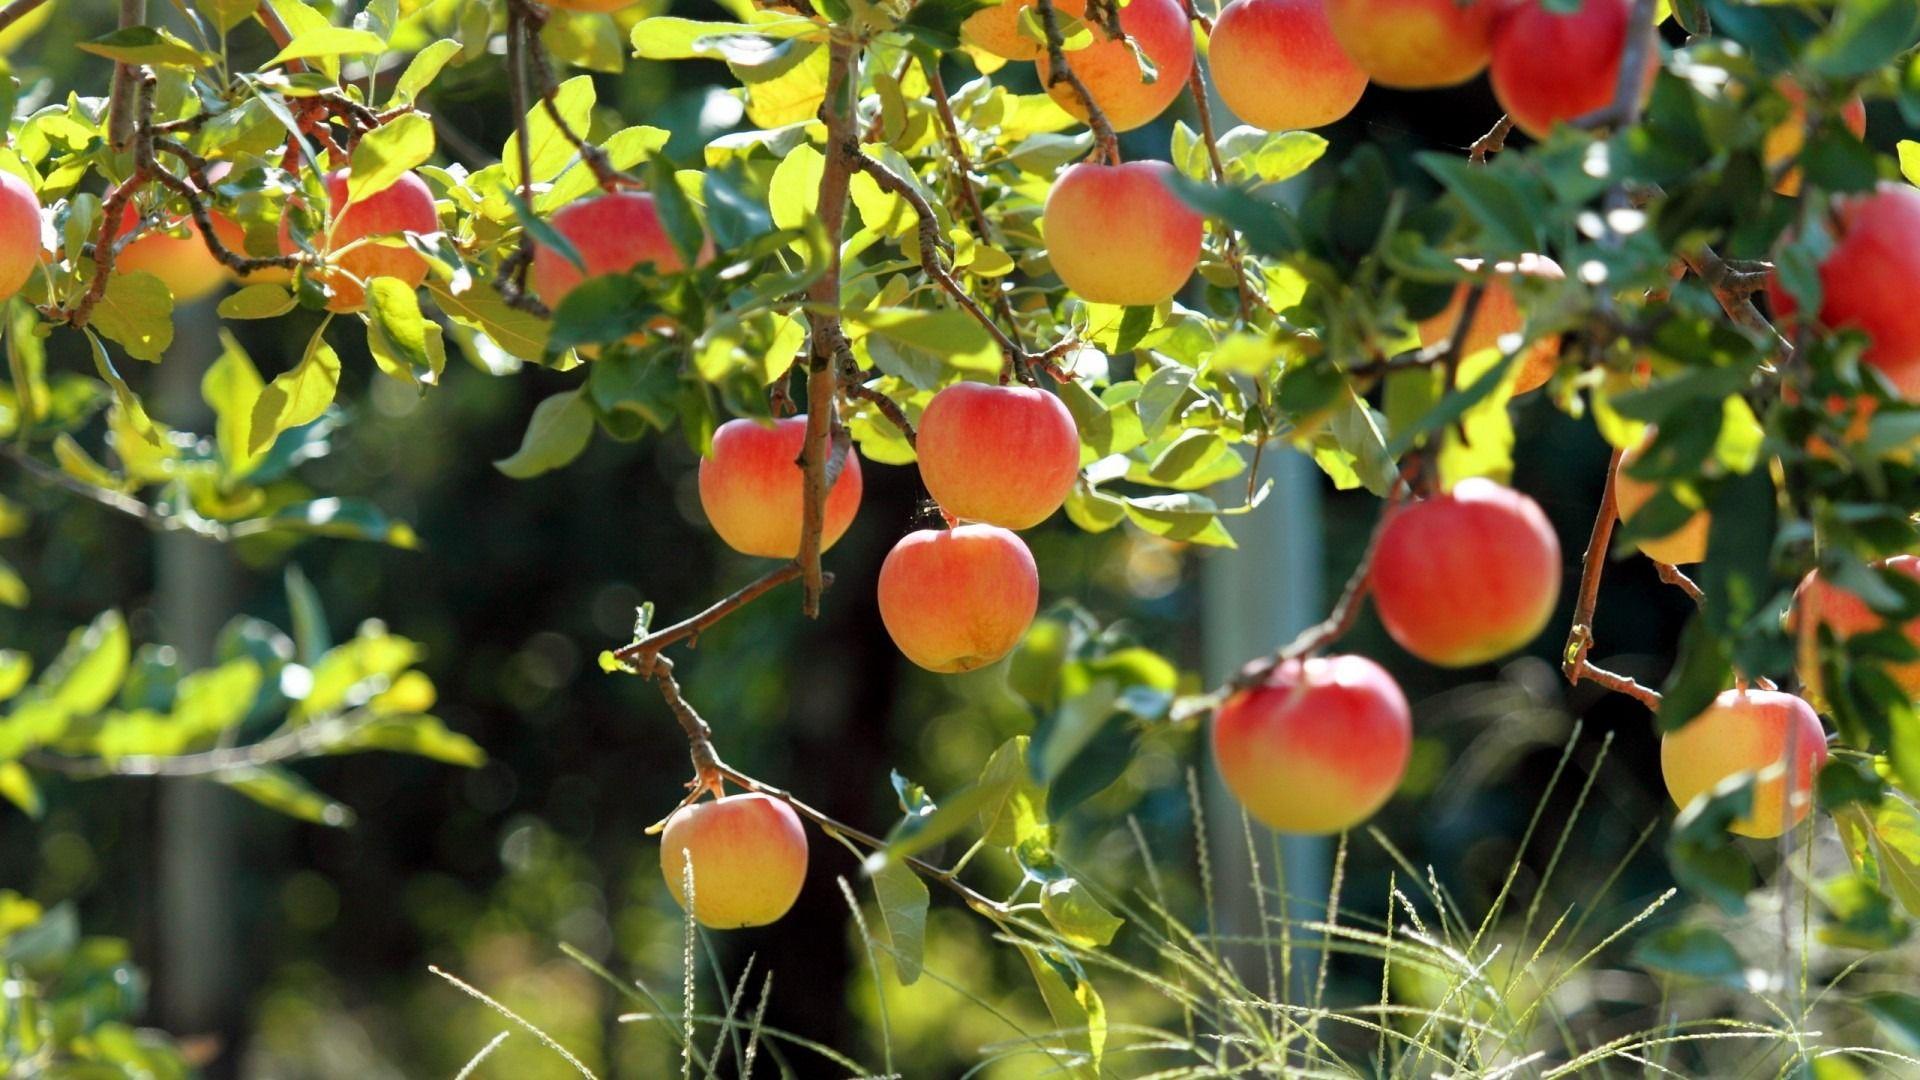 Quality Designs Of Apple Hd Wallpaper Free Fruit Garden Fruit Trees Fruit Wallpaper